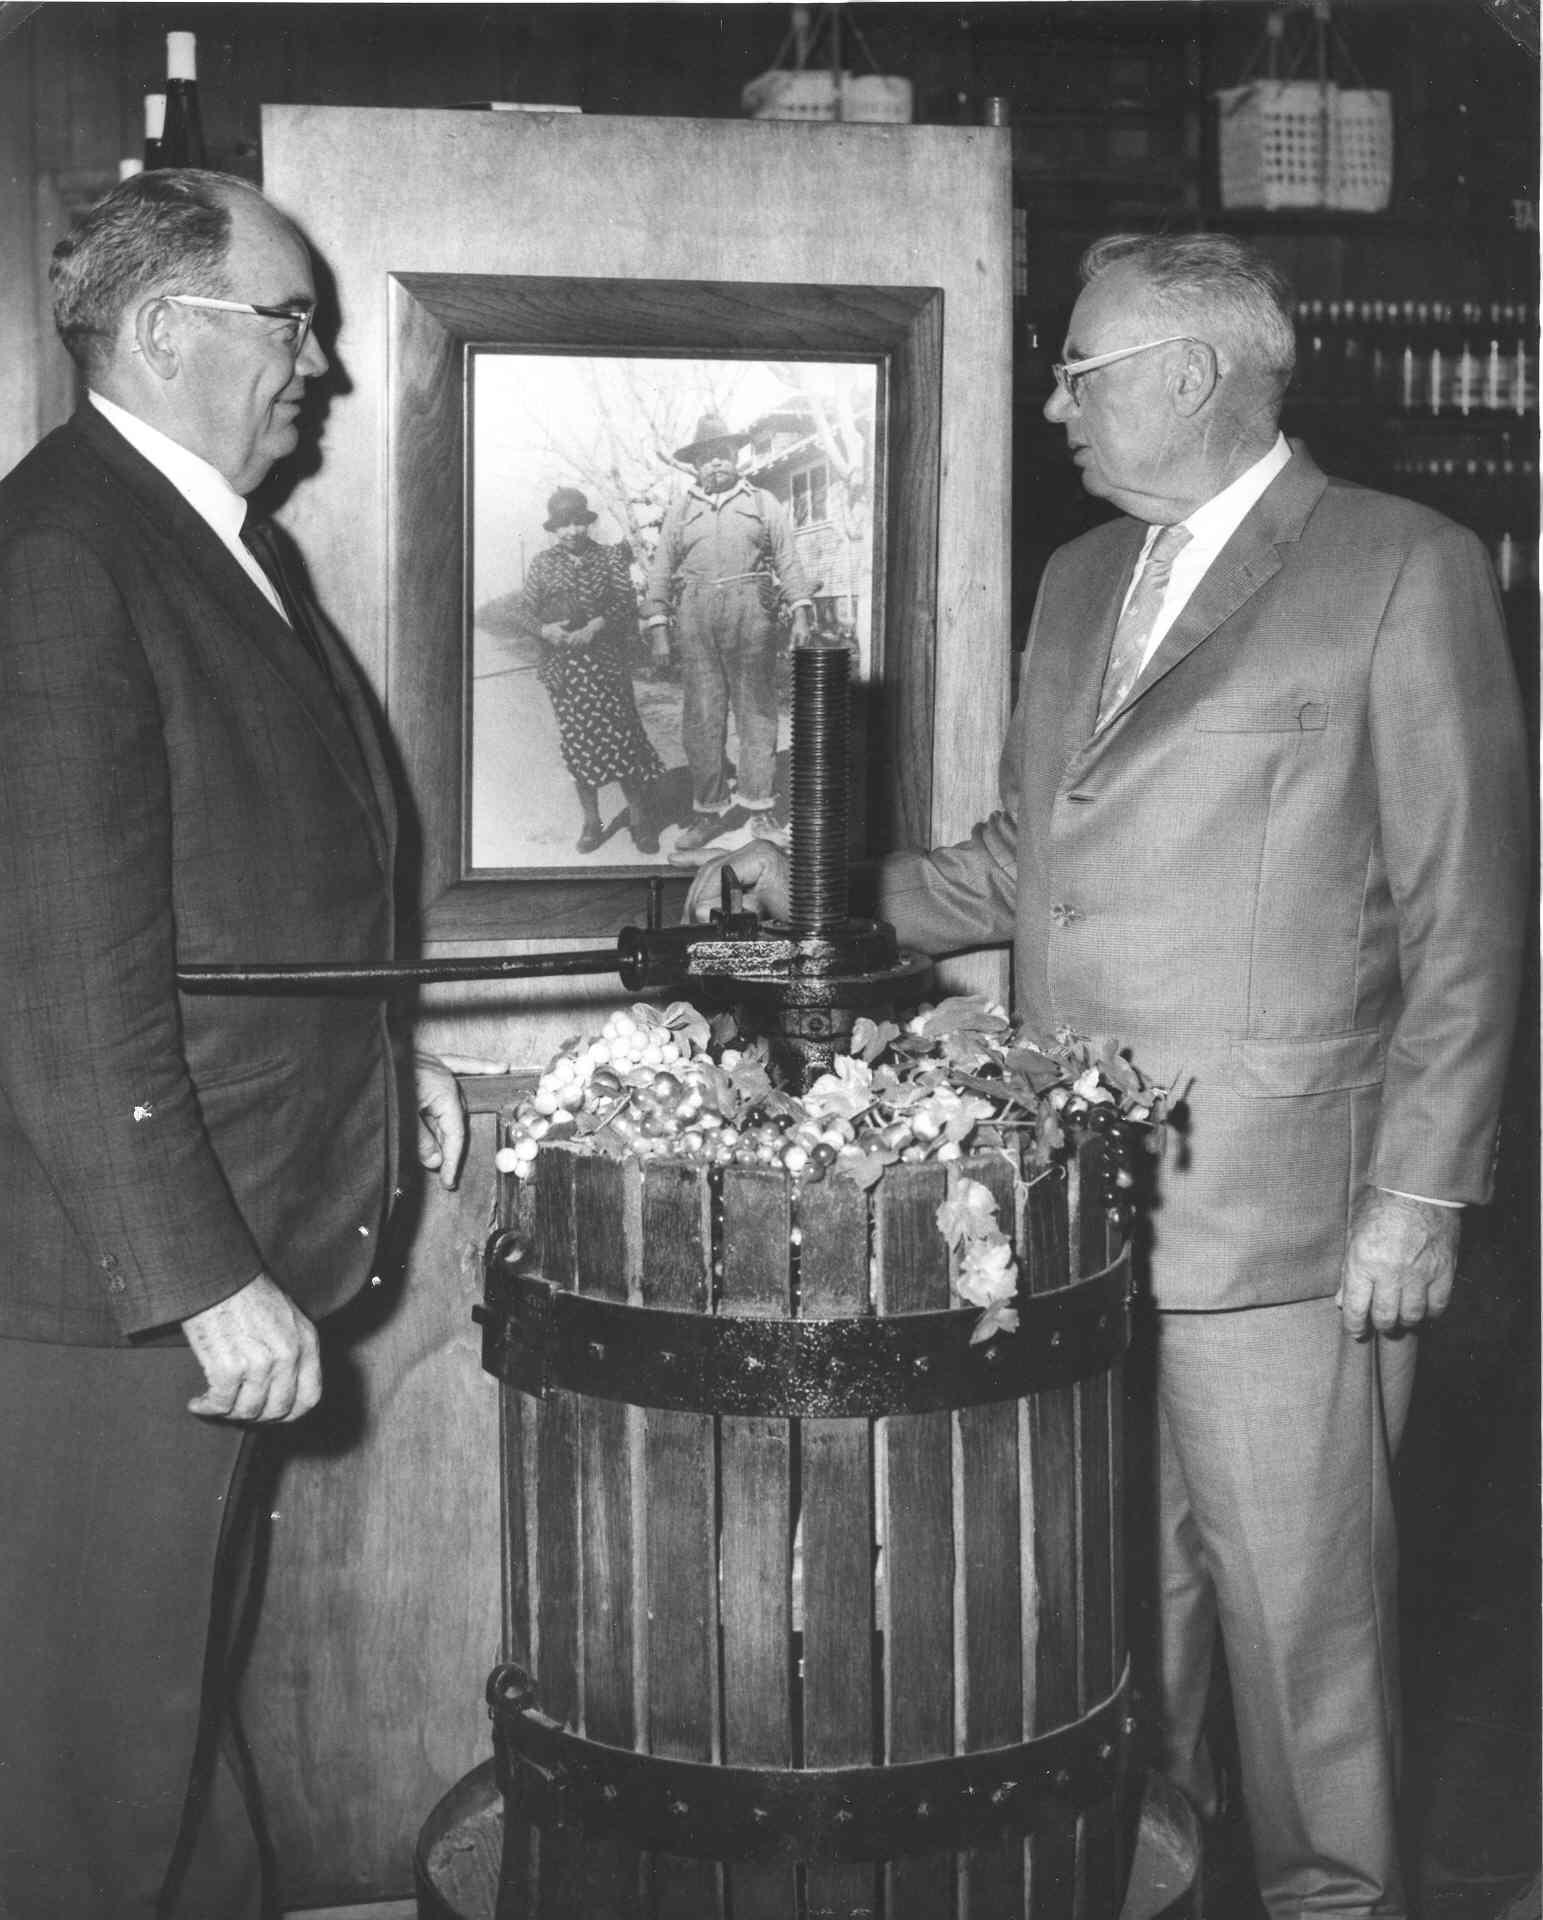 John and Joe with photo of Teresa and Guiseppe